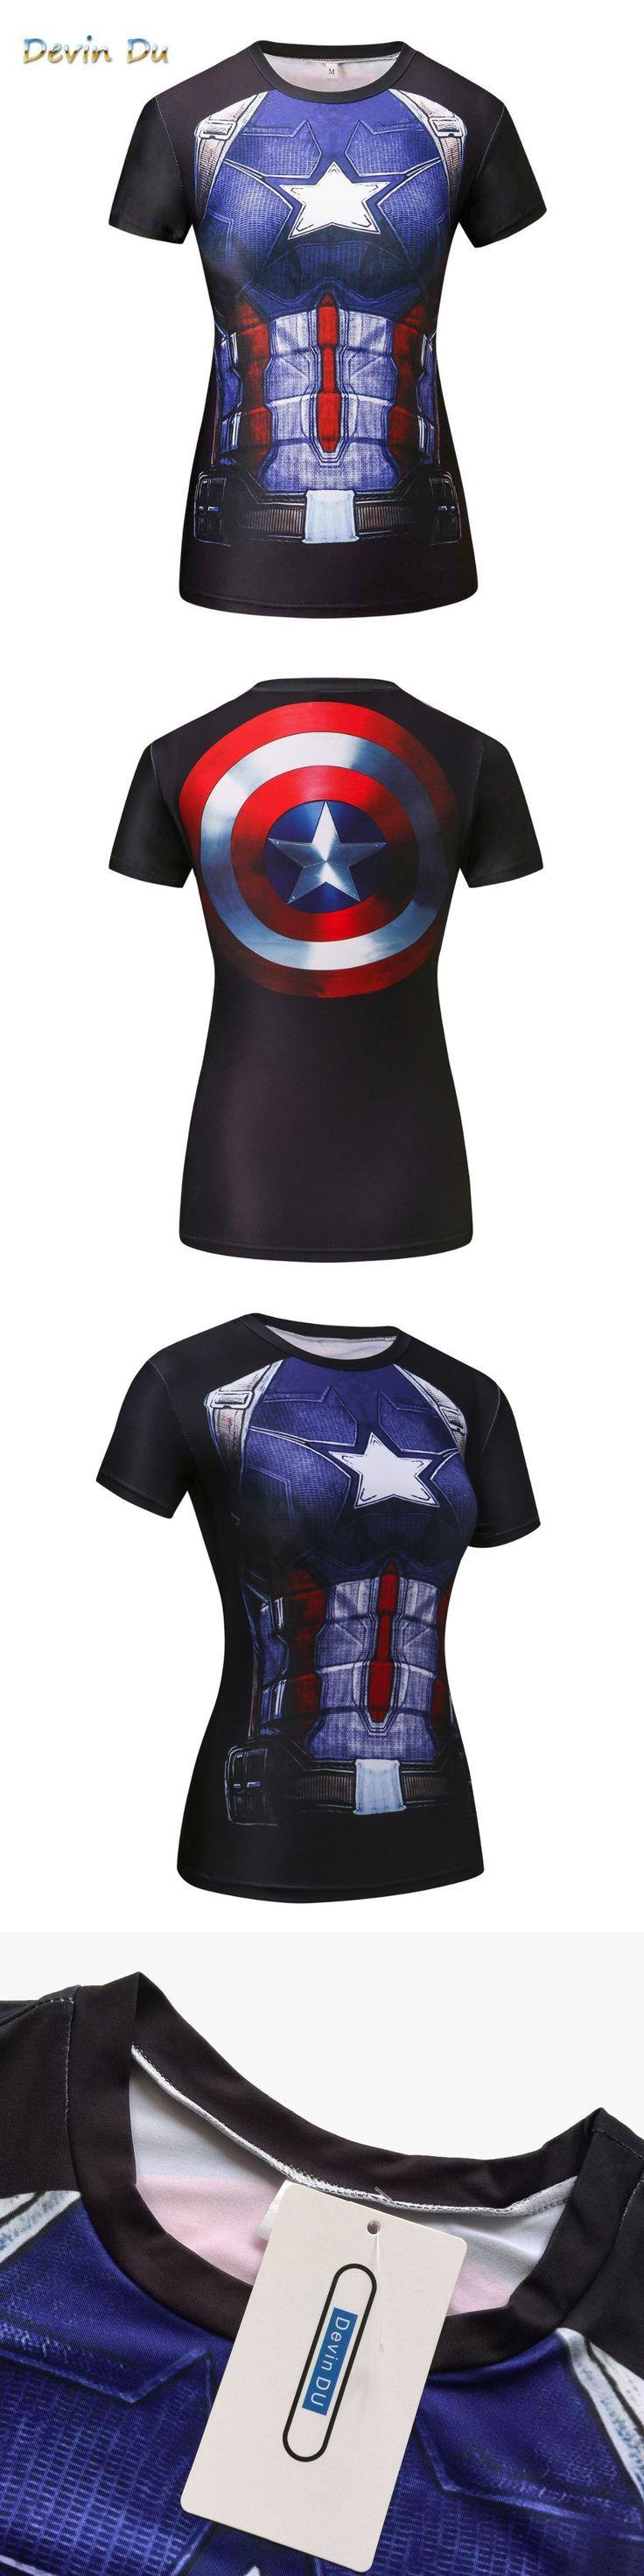 Compression T Shirt Superhero Women batman /Captain America/t Shirts Fitness T-shirts Camiseta Feminina dropship